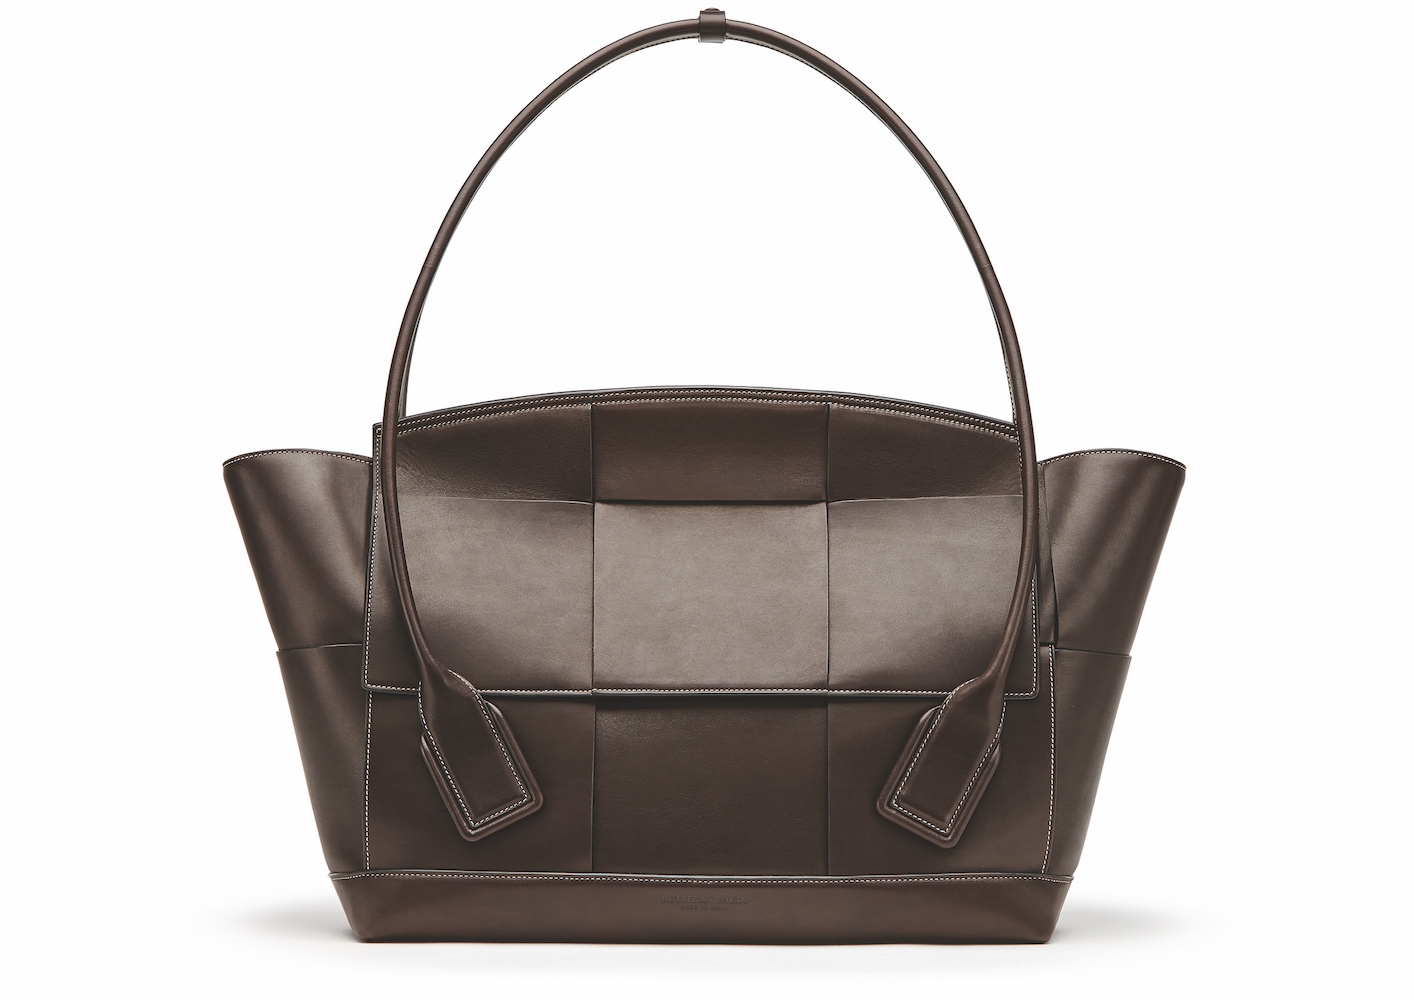 Bottega Veneta The Arco Bag (1).jpg